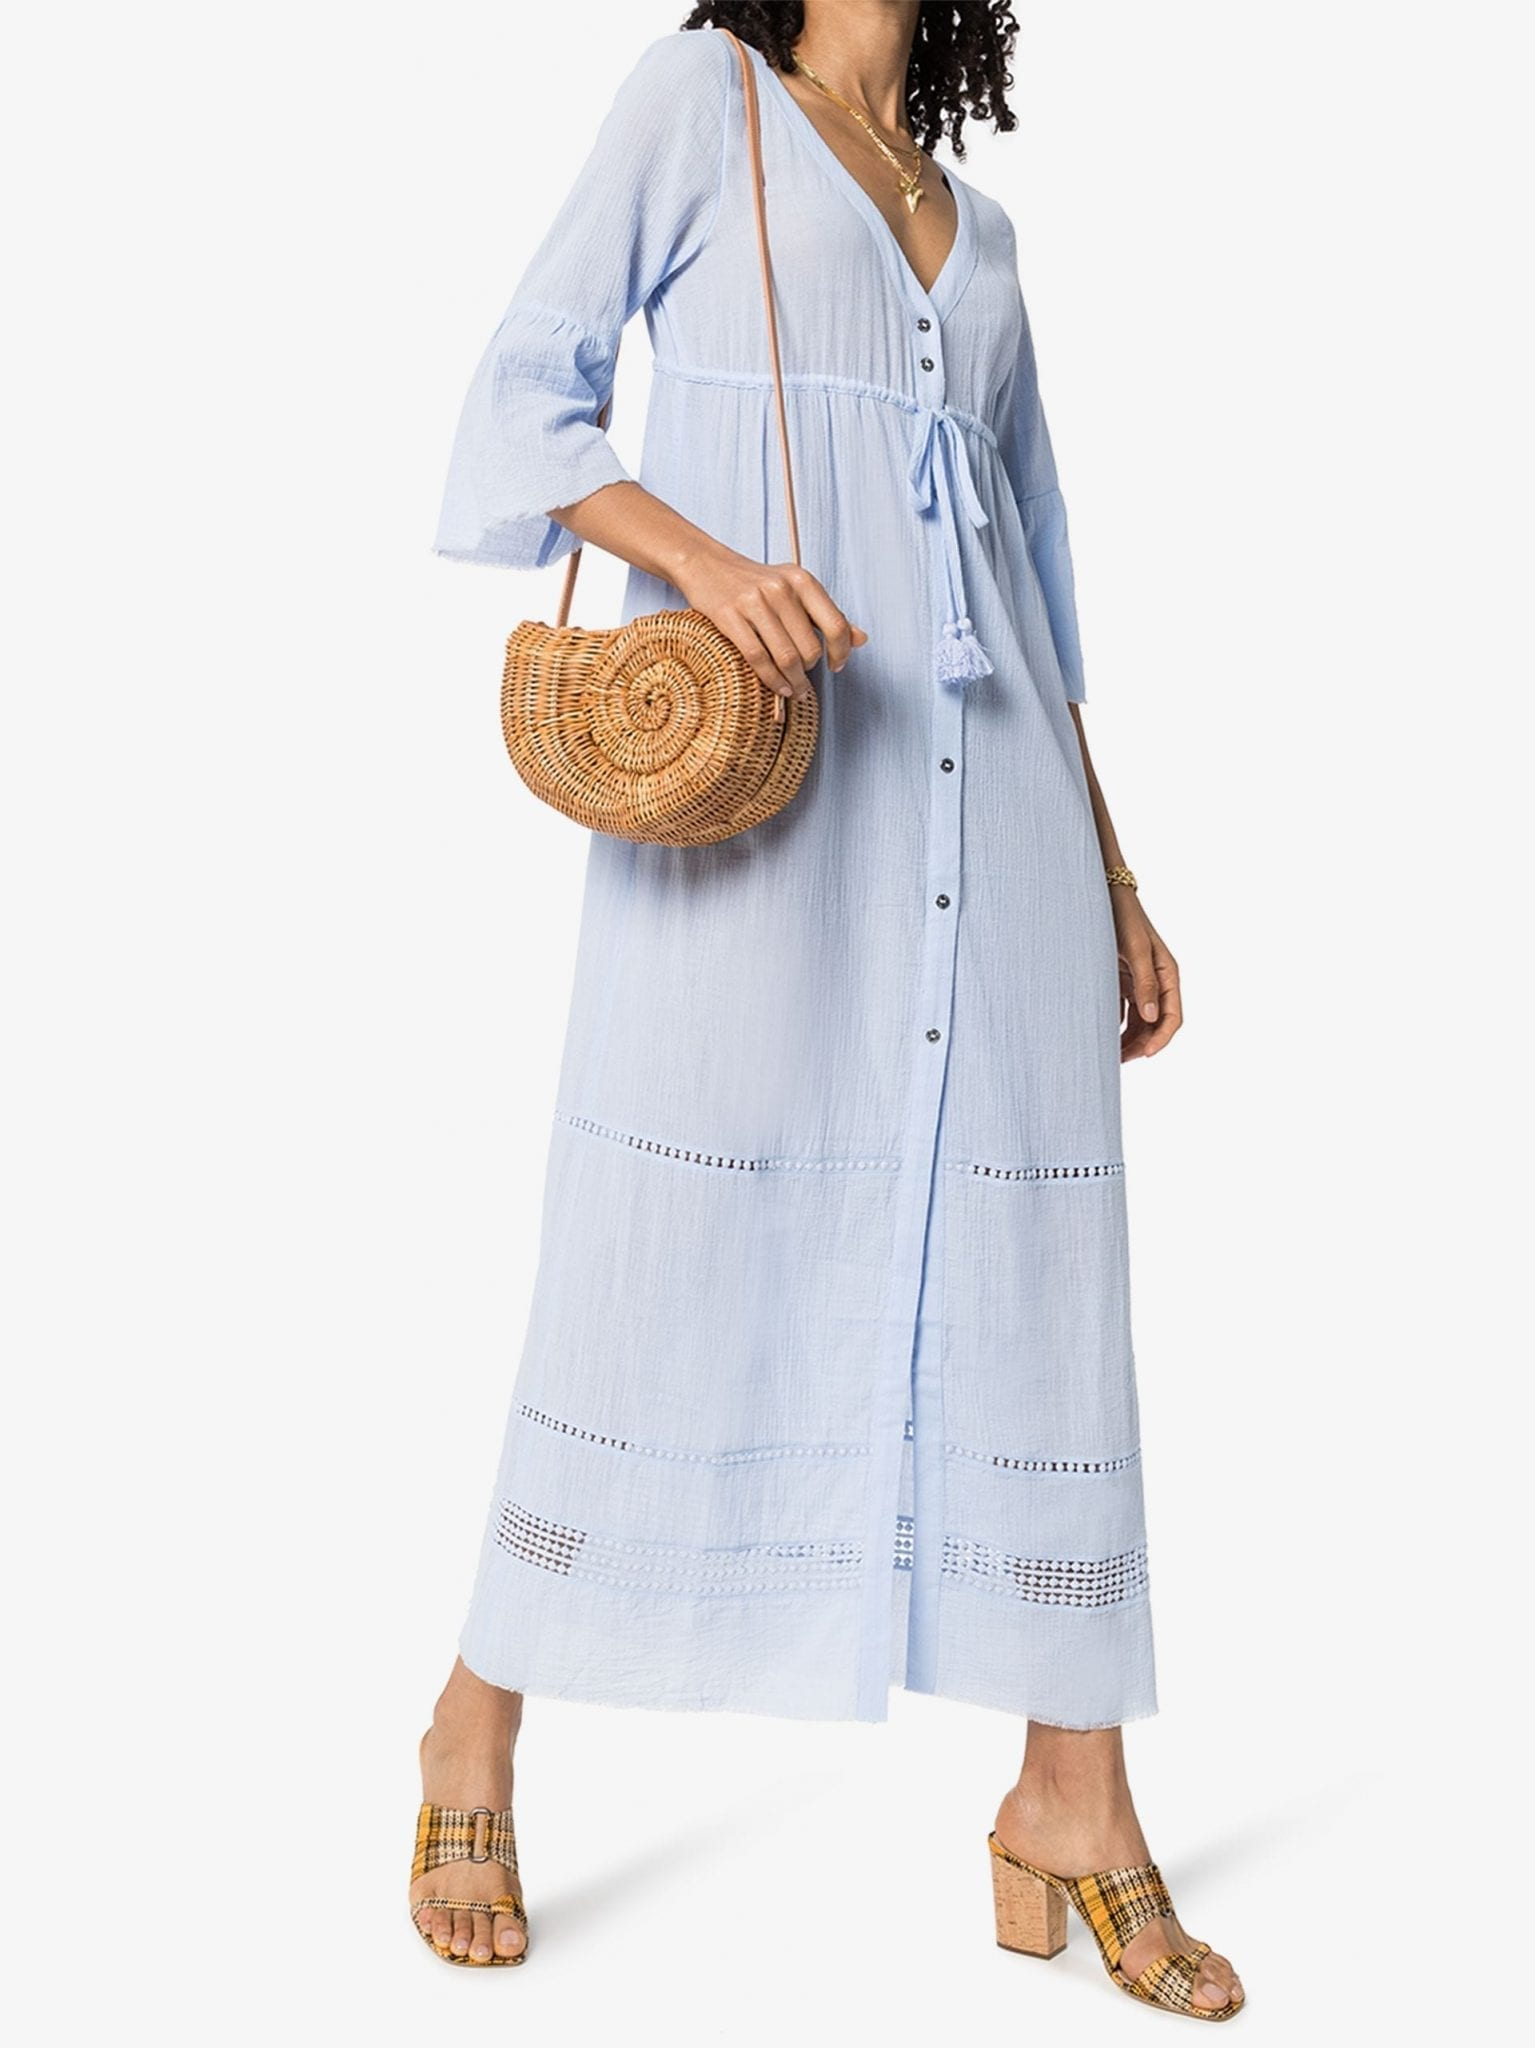 HEIDI KLEIN Azores Tie Front Cotton Kaftan Dress